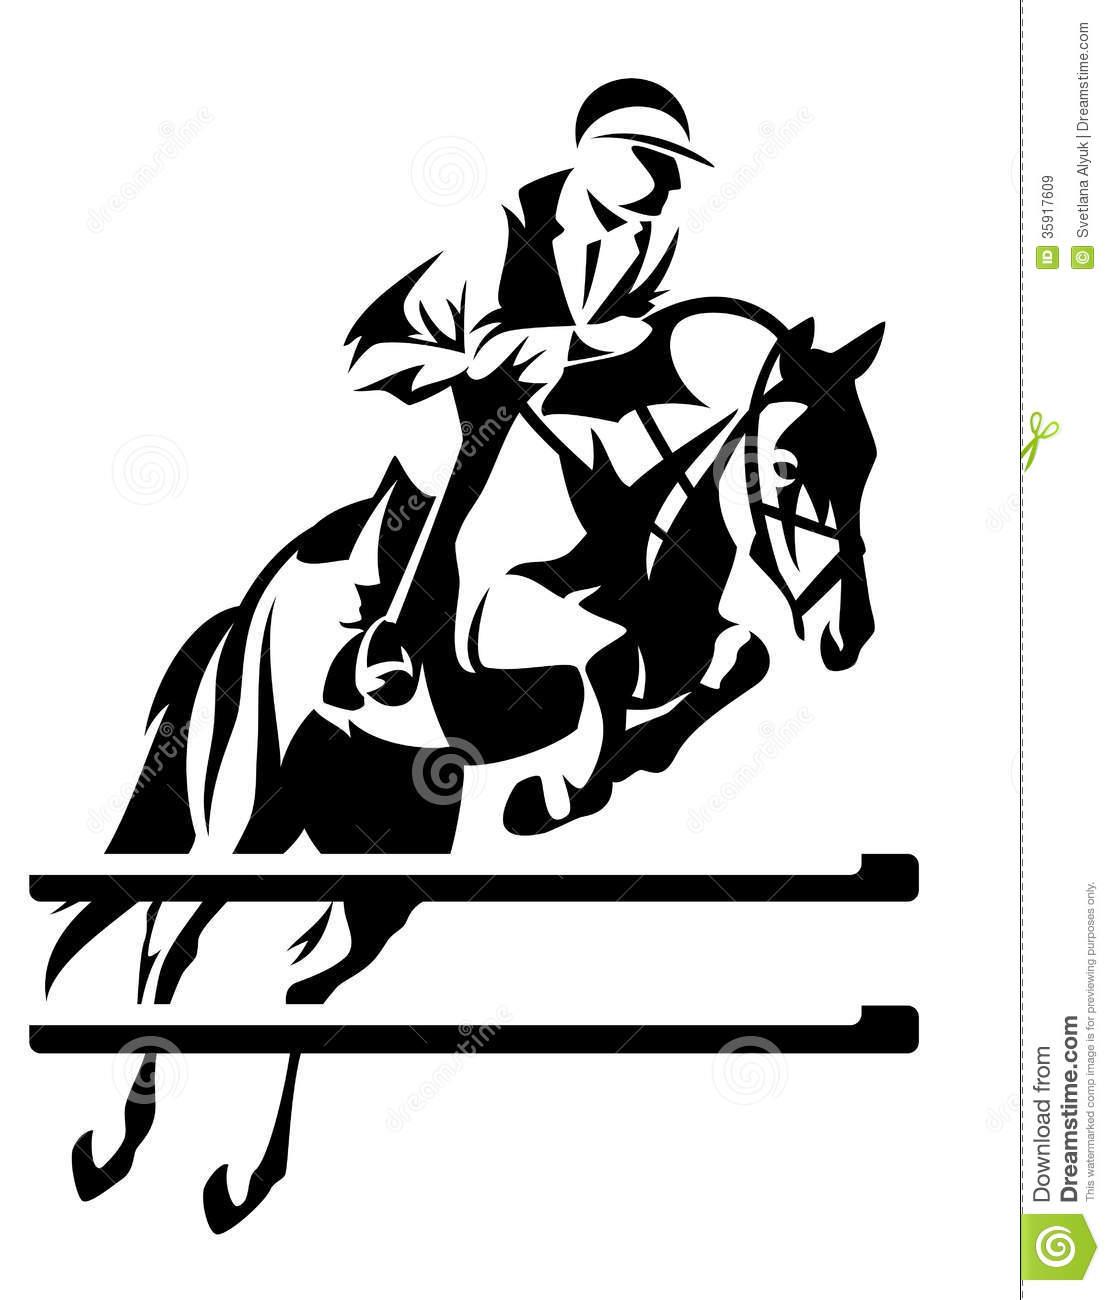 hight resolution of show jumping horseman design black and white equestrian sport emblem